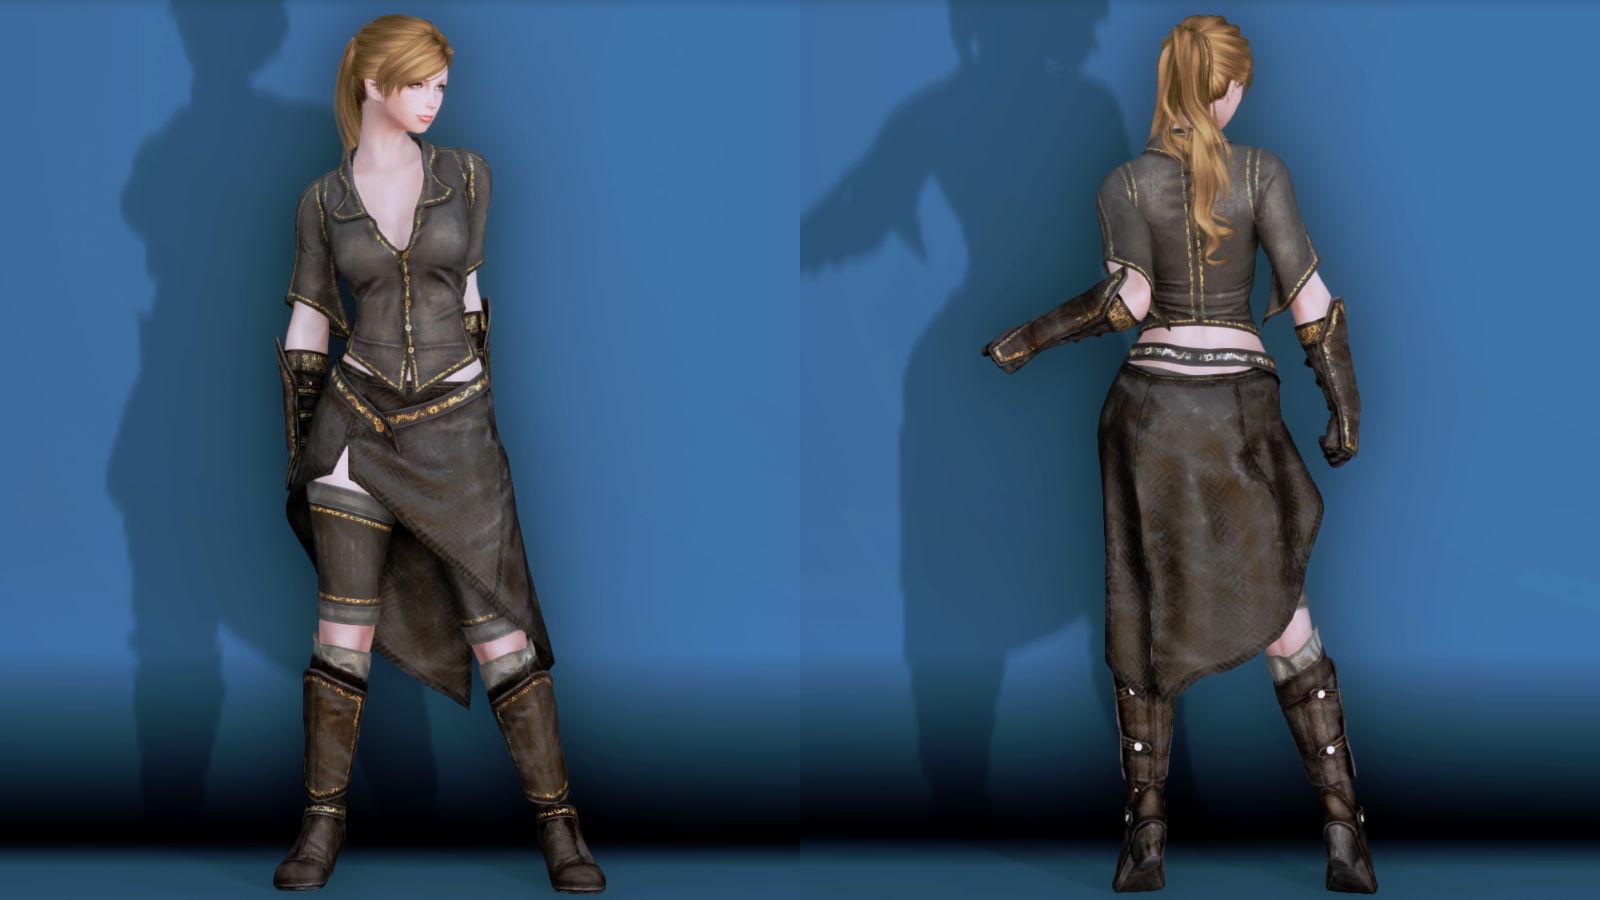 RuggedRogueSSE 121-1 Pose Fu-Ba-F Blouse Skirt W 2